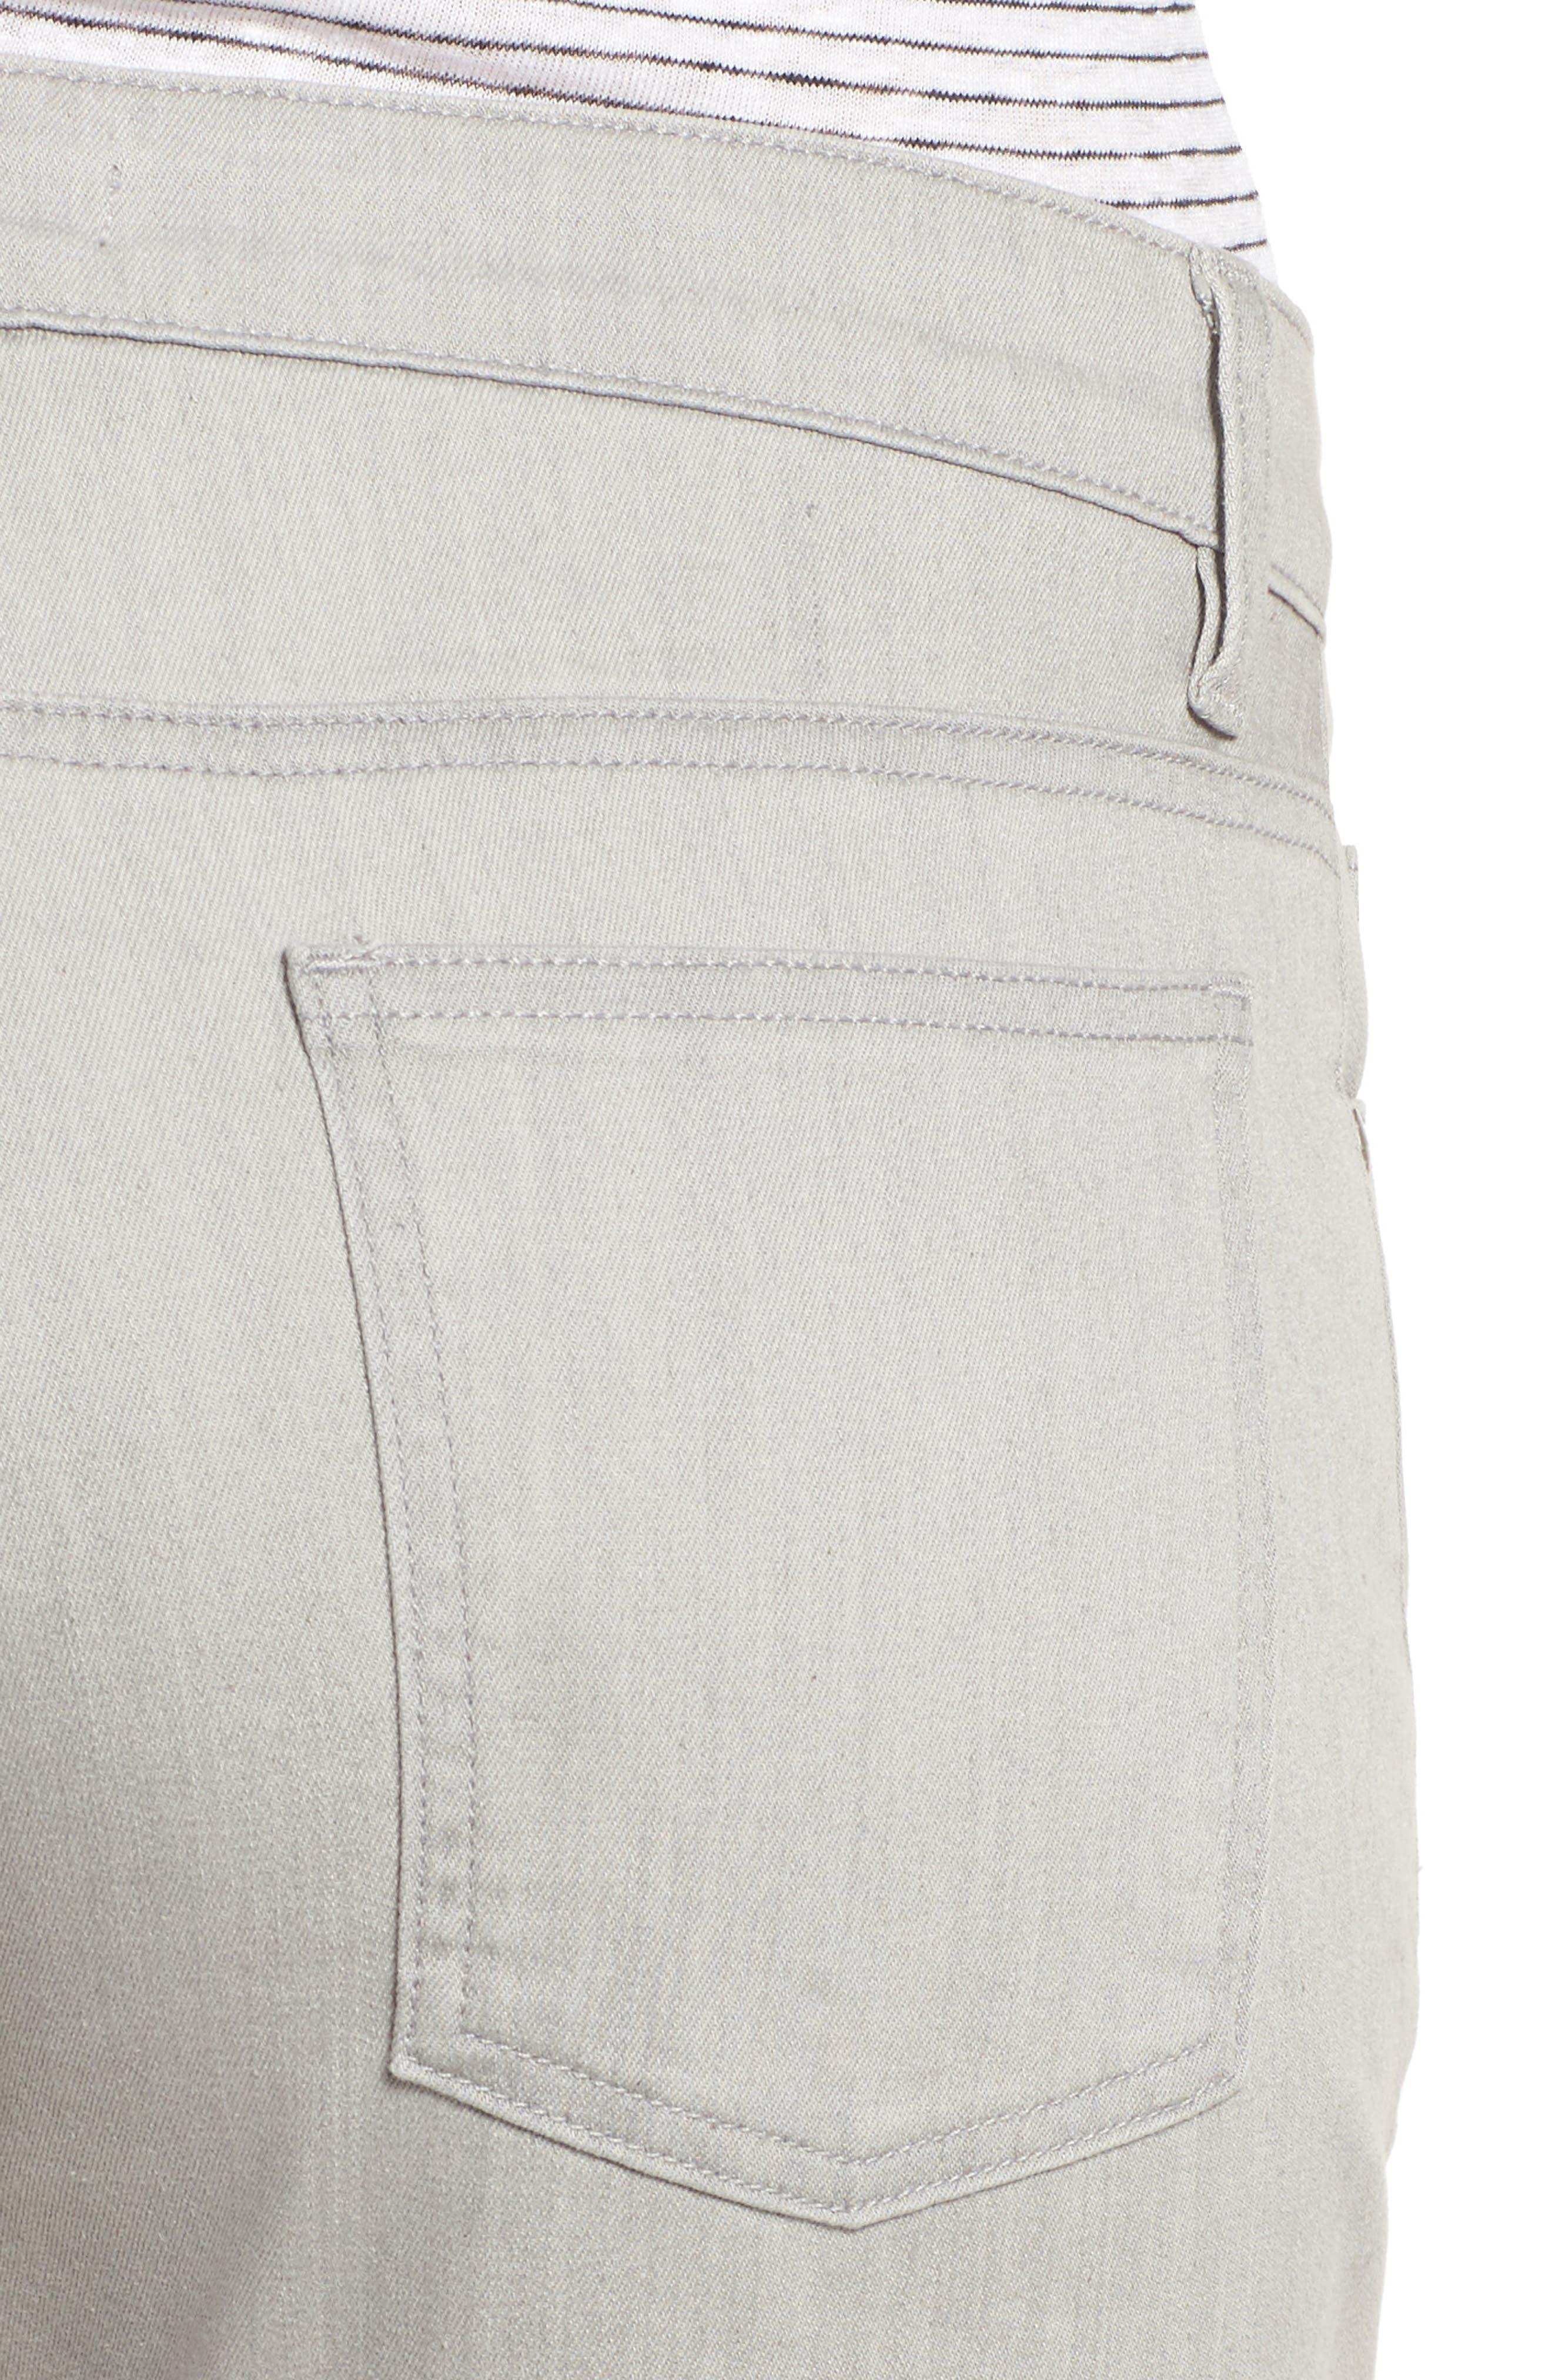 Organic Cotton Blend Crop Flare Jeans,                             Alternate thumbnail 4, color,                             Sun Bleached Gray